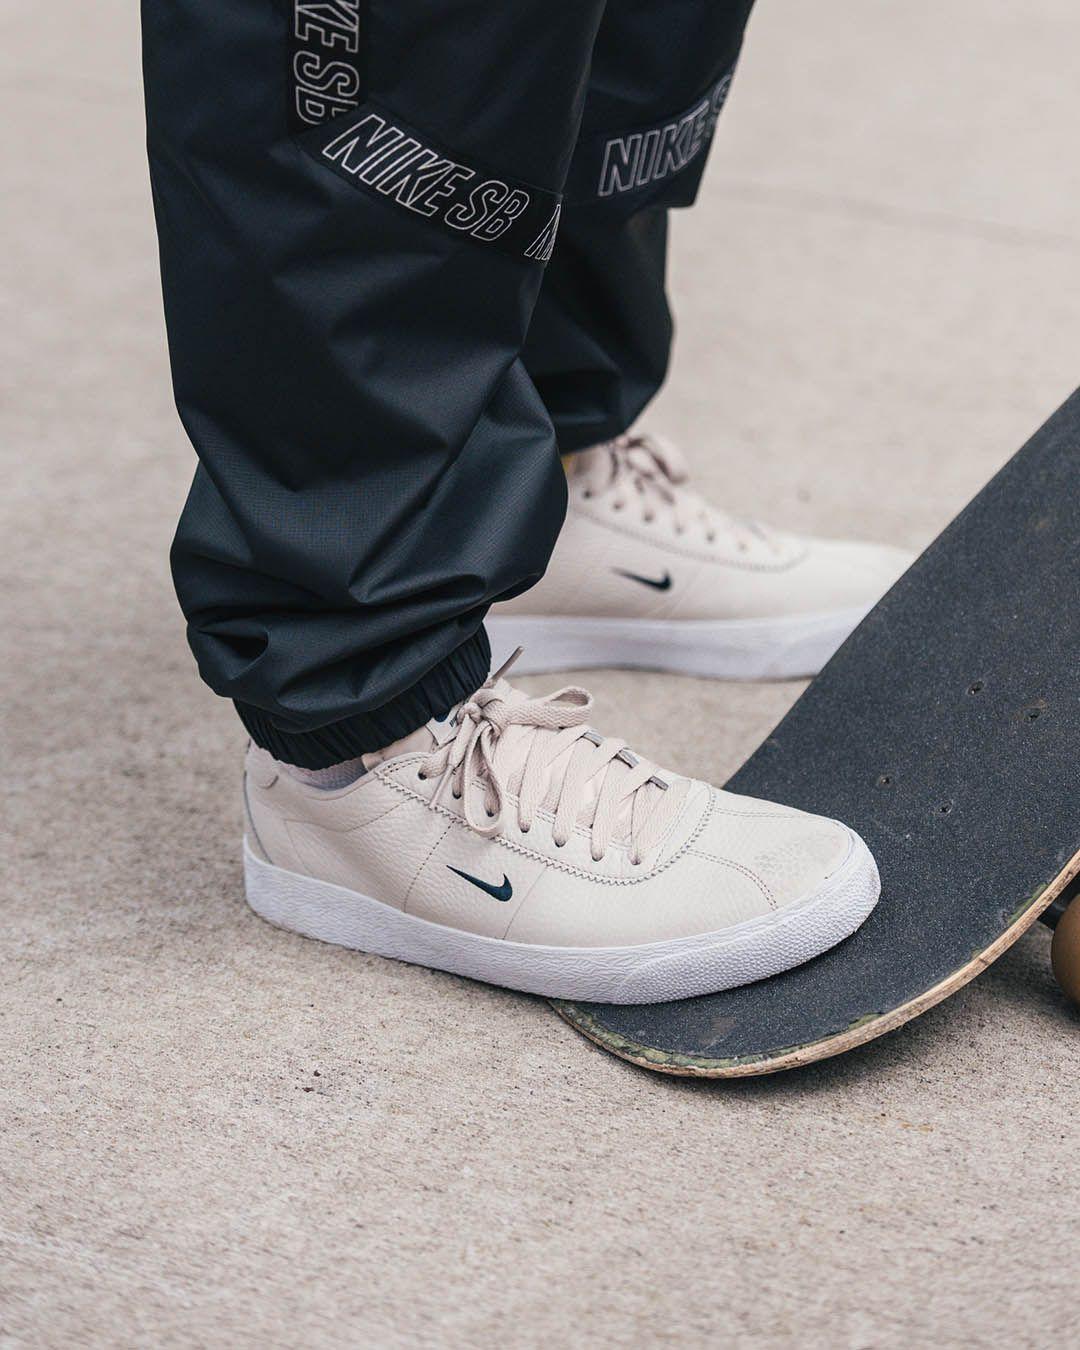 Nike SB Bruin Ultra | Nike sb, Nike, Skateschuhe